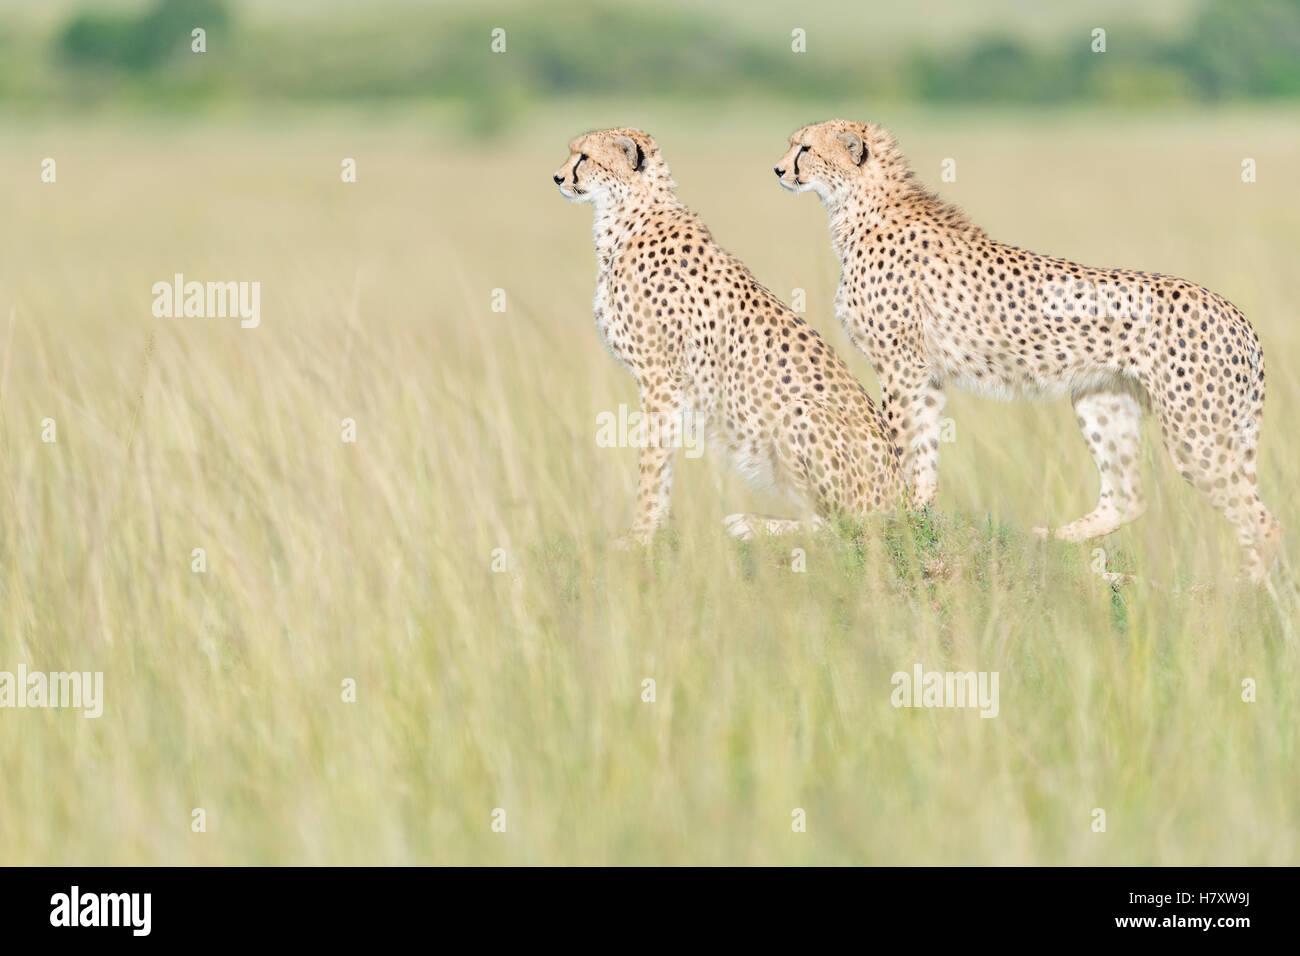 Two Cheetah (Acinonix jubatus) standing on the look out at savanna, Maasai Mara National Reserve, Kenya - Stock Image